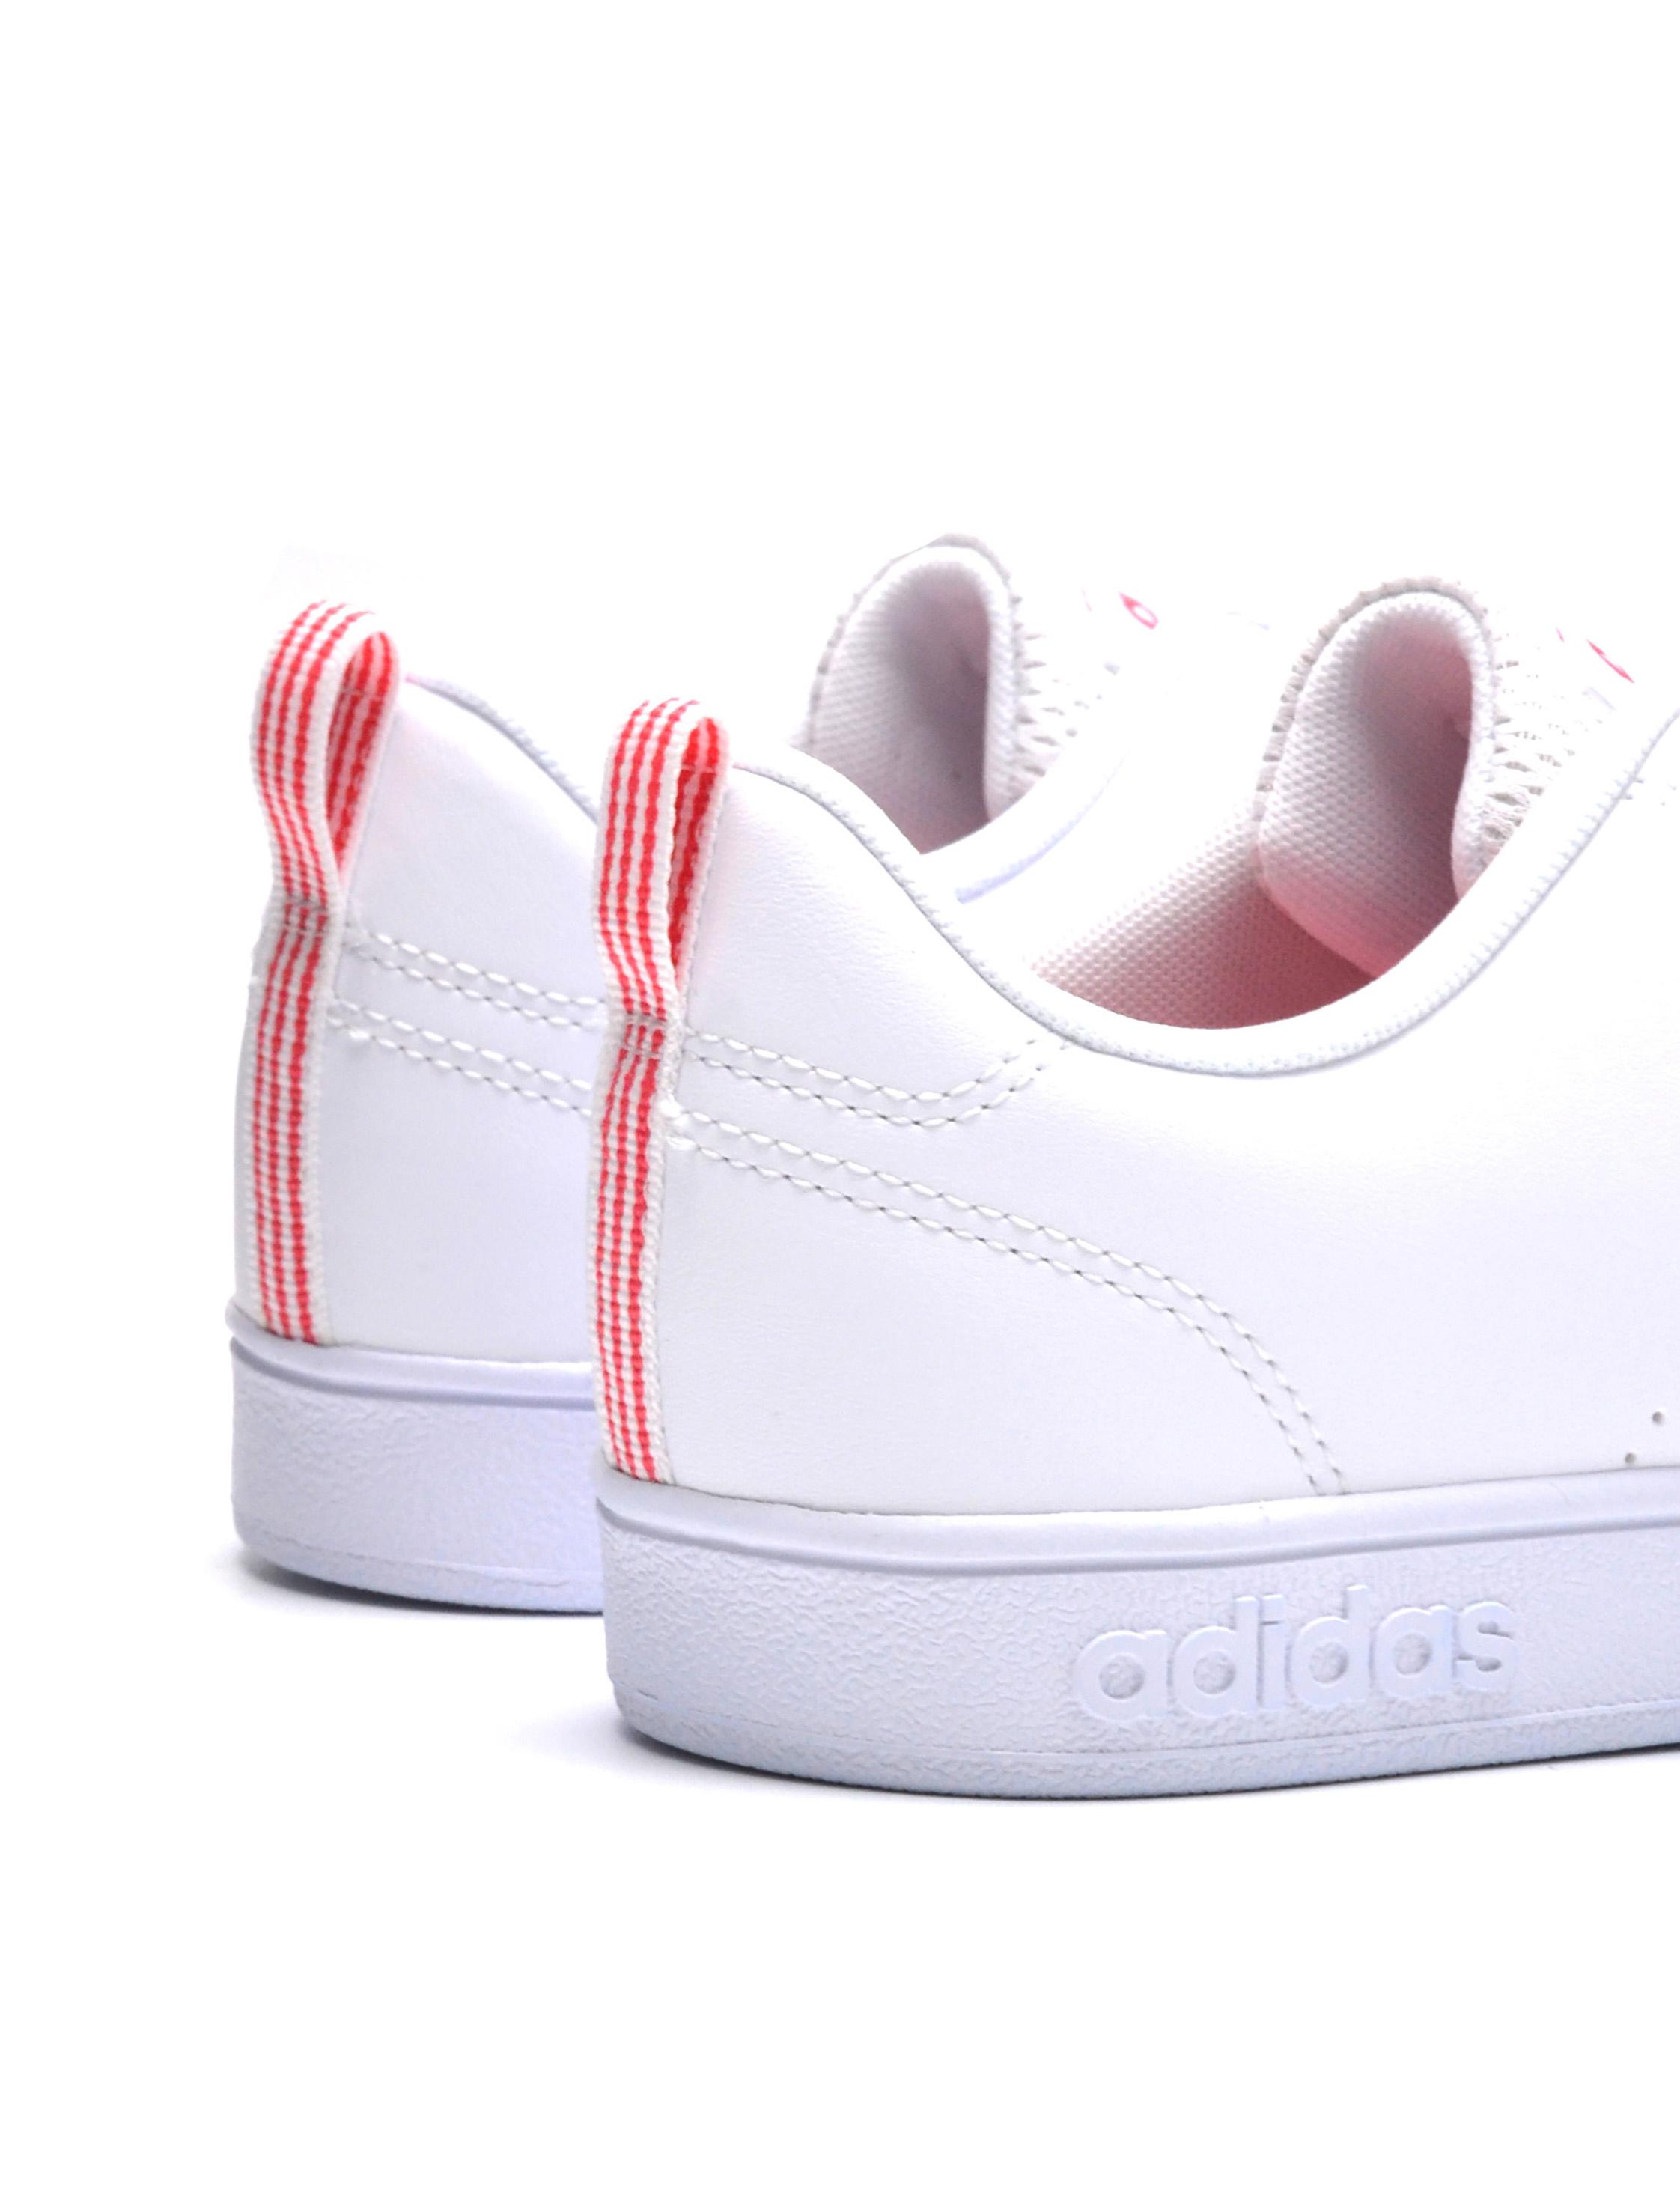 adidas glide stivali 6 vs 7